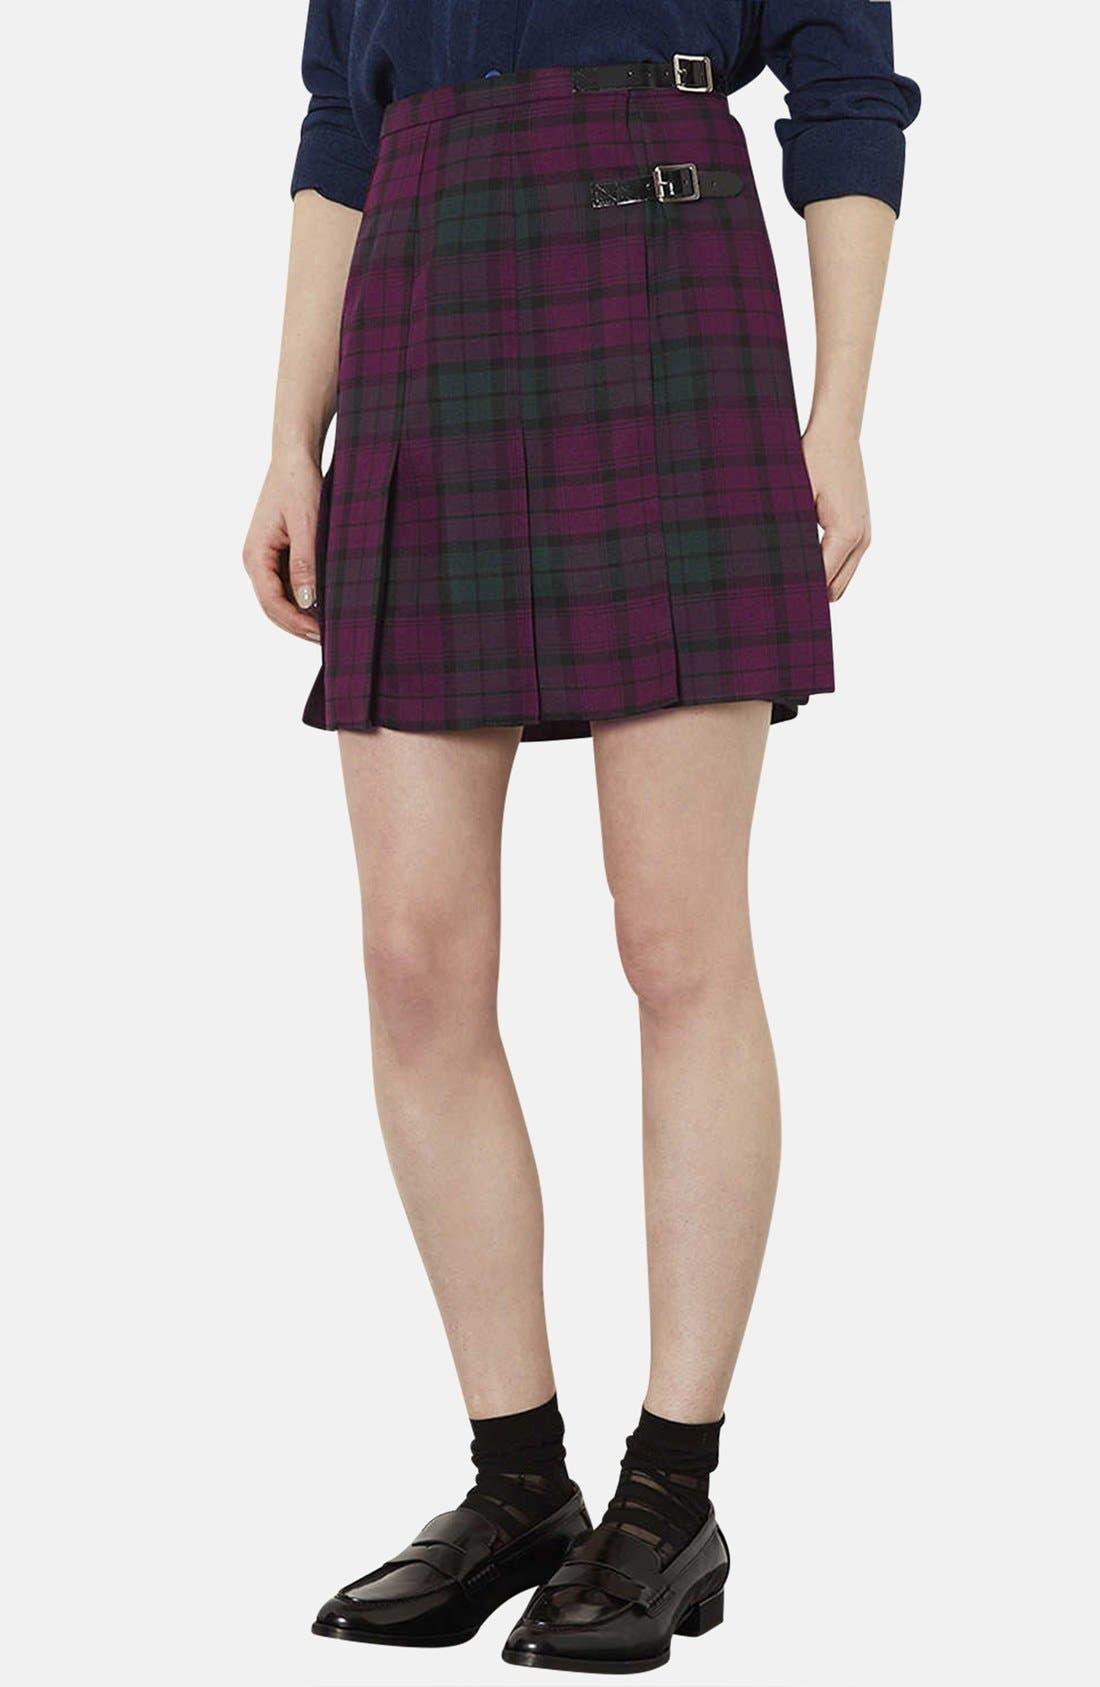 Alternate Image 1 Selected - Topshop Plaid Kilt Skirt